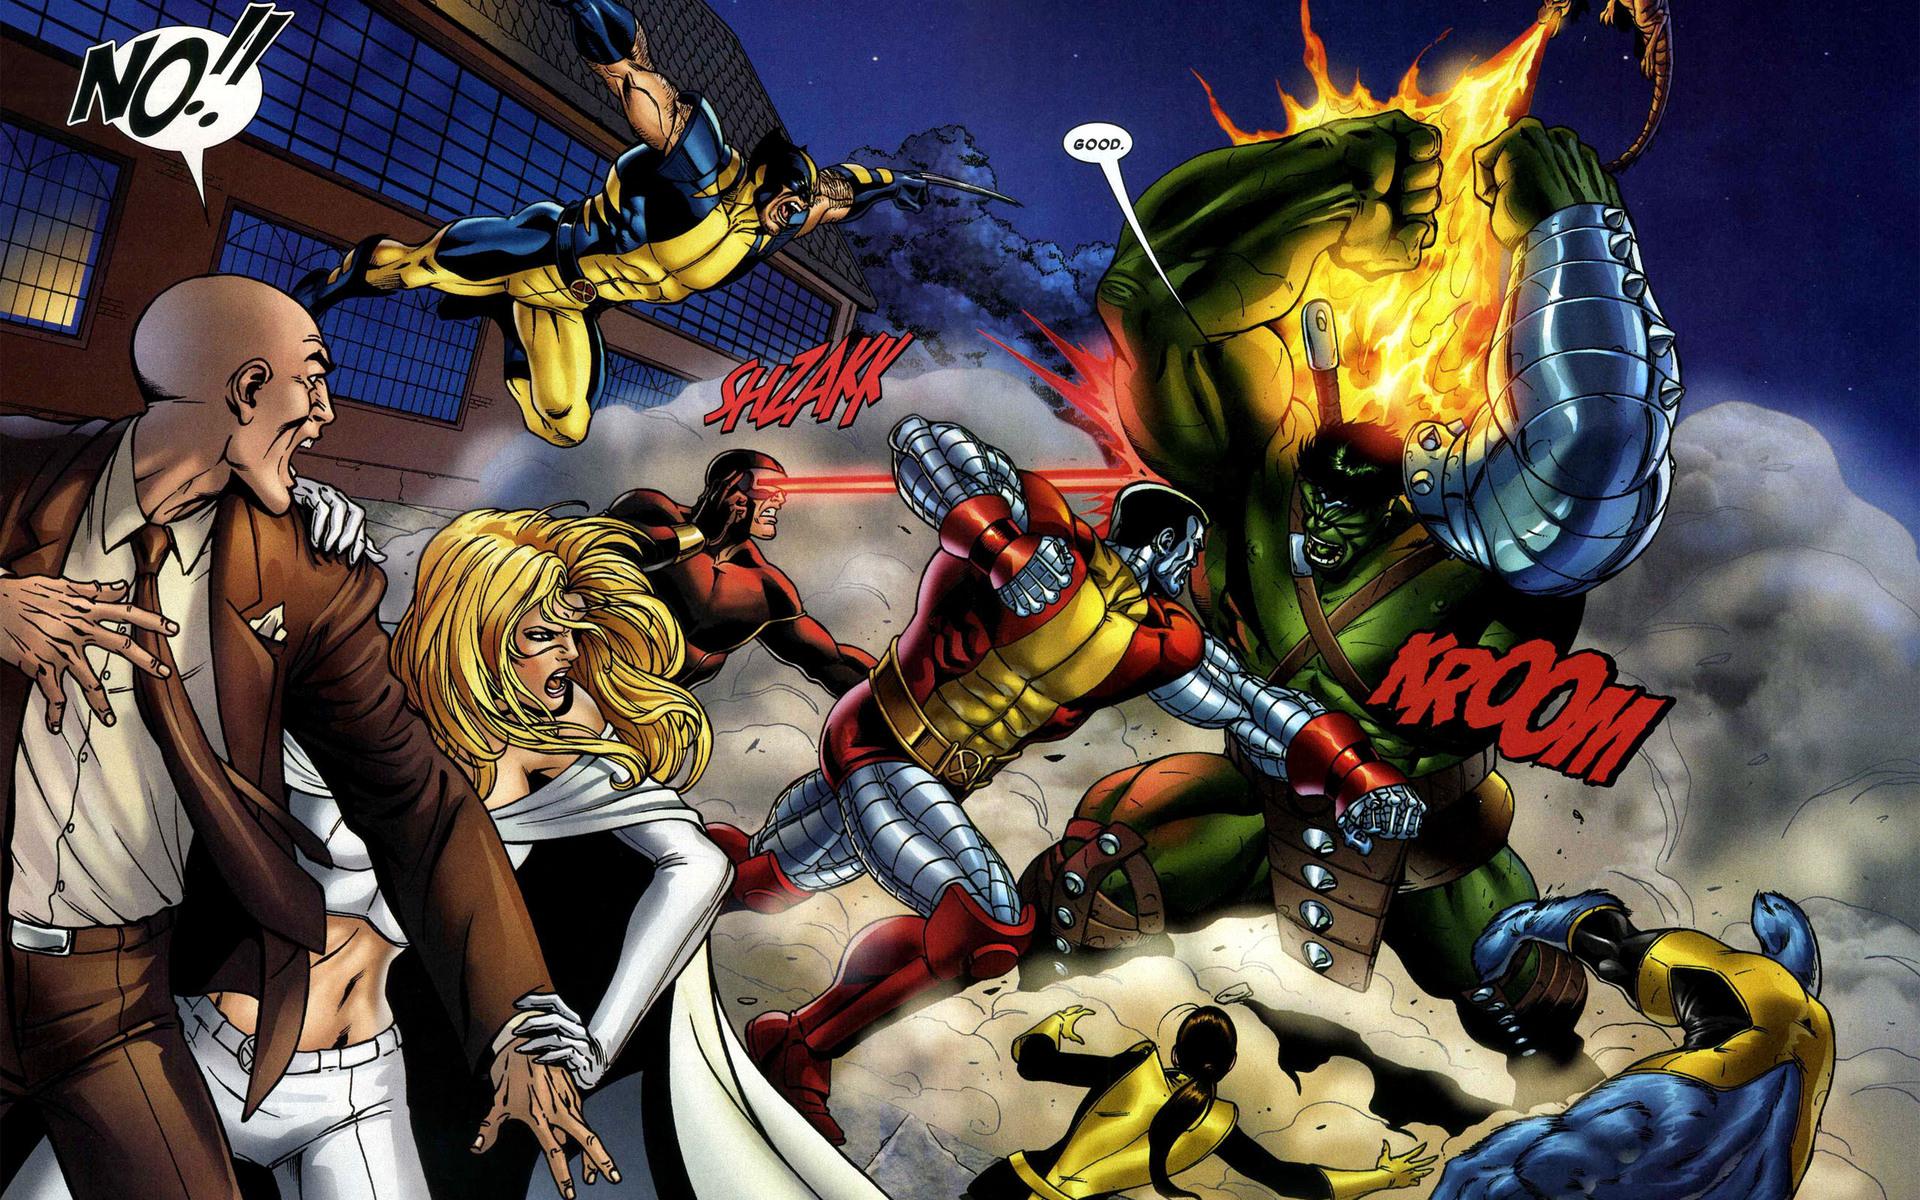 Top Wallpaper Marvel Xmen - X-men-Vs-The-Hulk-x-universe-32273087-1920-1200  Perfect Image Reference_11569.jpg